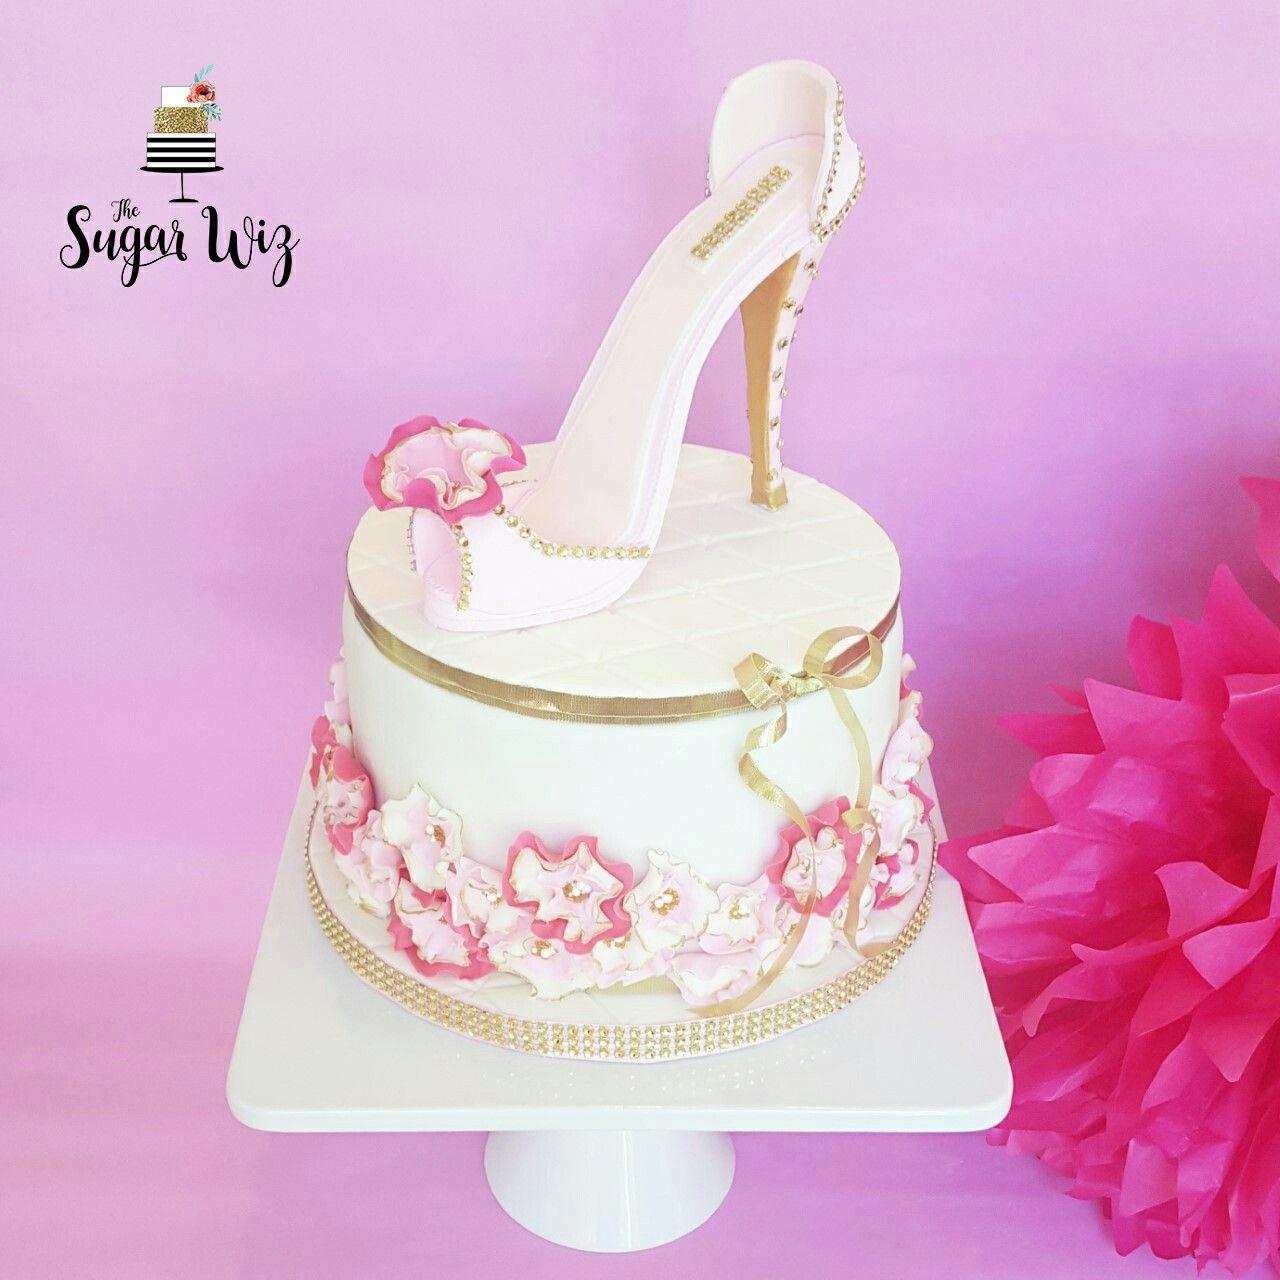 Groovy Fashion Cake Fashion Cupcakes Fashion Birthday Cake Makeup Cake Funny Birthday Cards Online Bapapcheapnameinfo